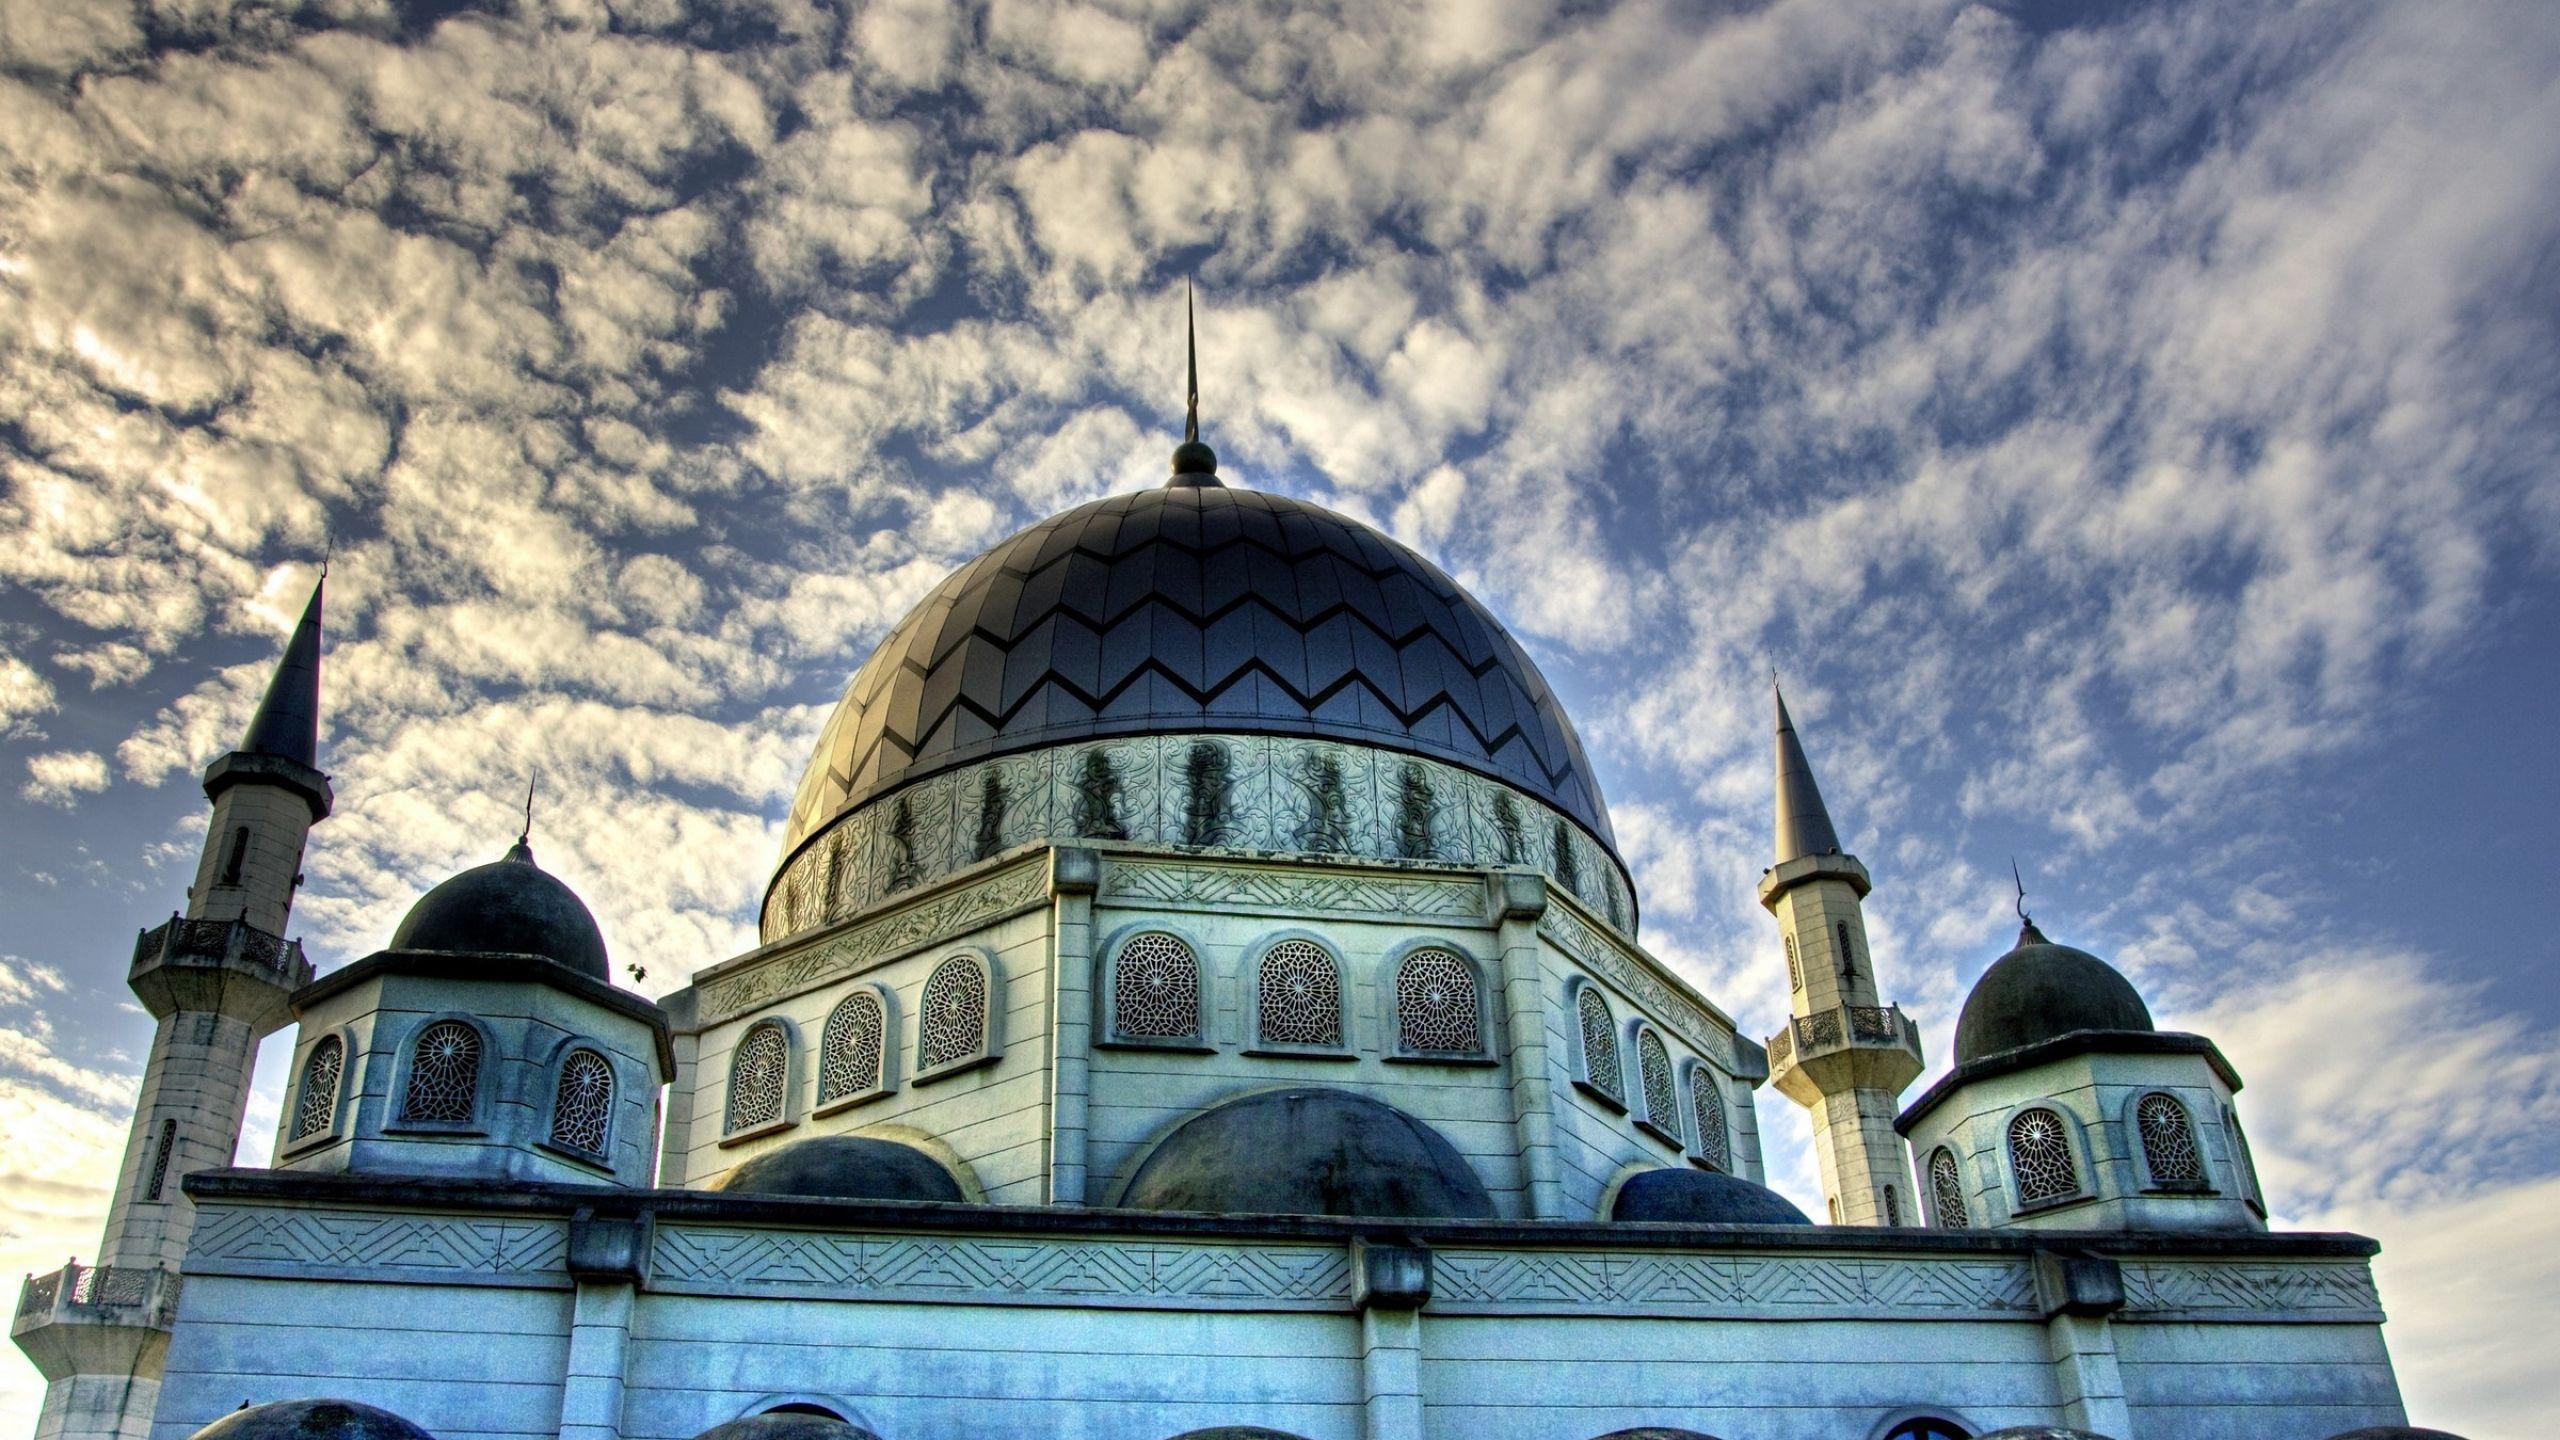 Mosque Hdr Hdpicorner Islamic Wallpaper Hd Islamic Wallpaper Mosque